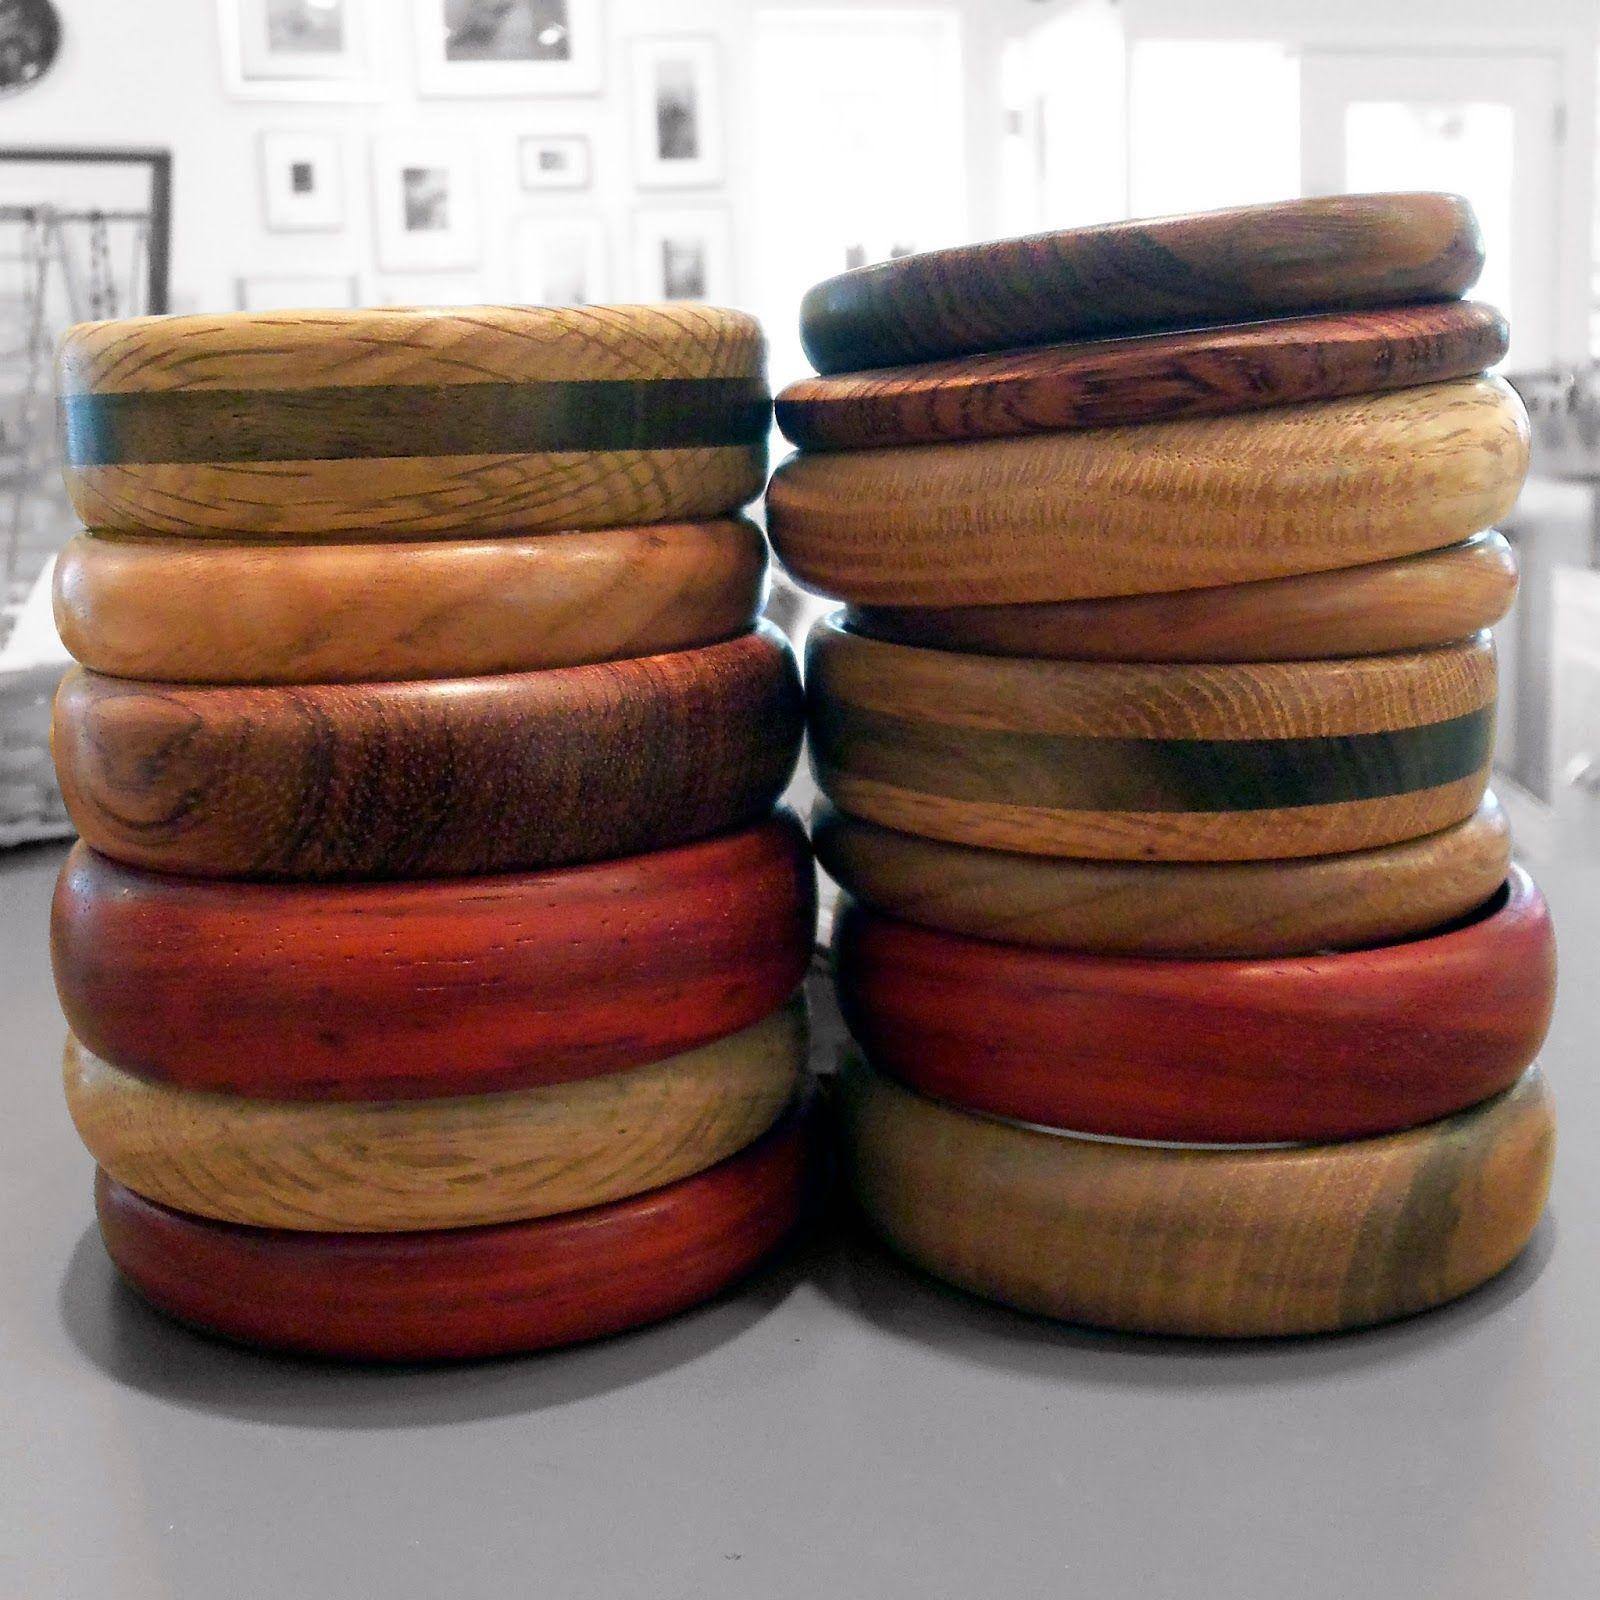 Hand-turned Wood Bracelets - Joseph Verret | Touchstone Gallery